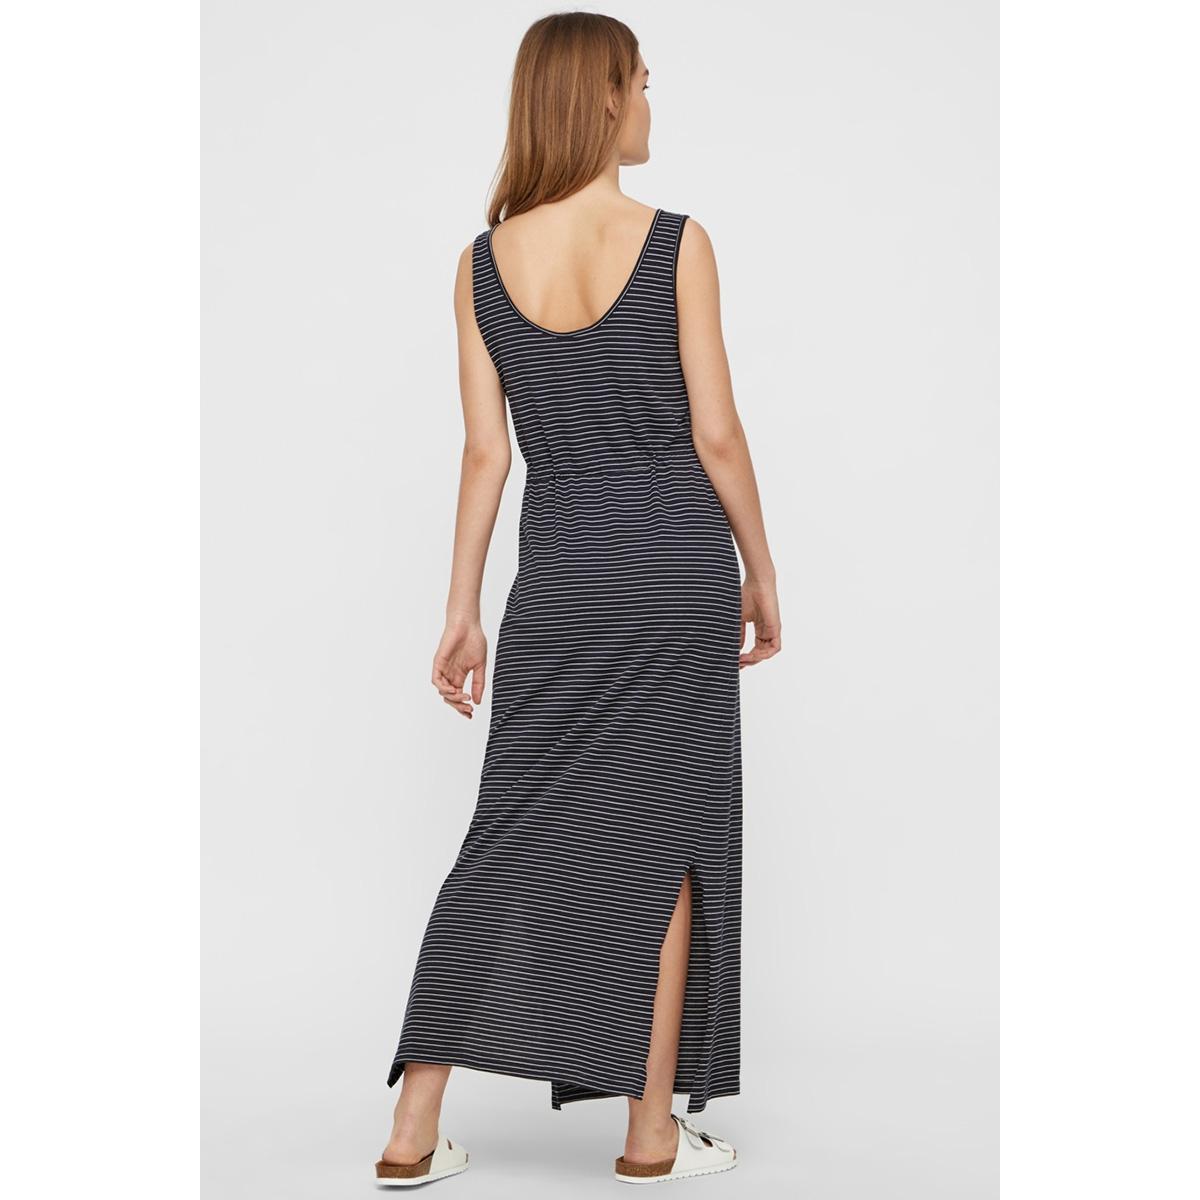 vmdaina dress noos 10215415 vero moda jurk night sky/narrow sno